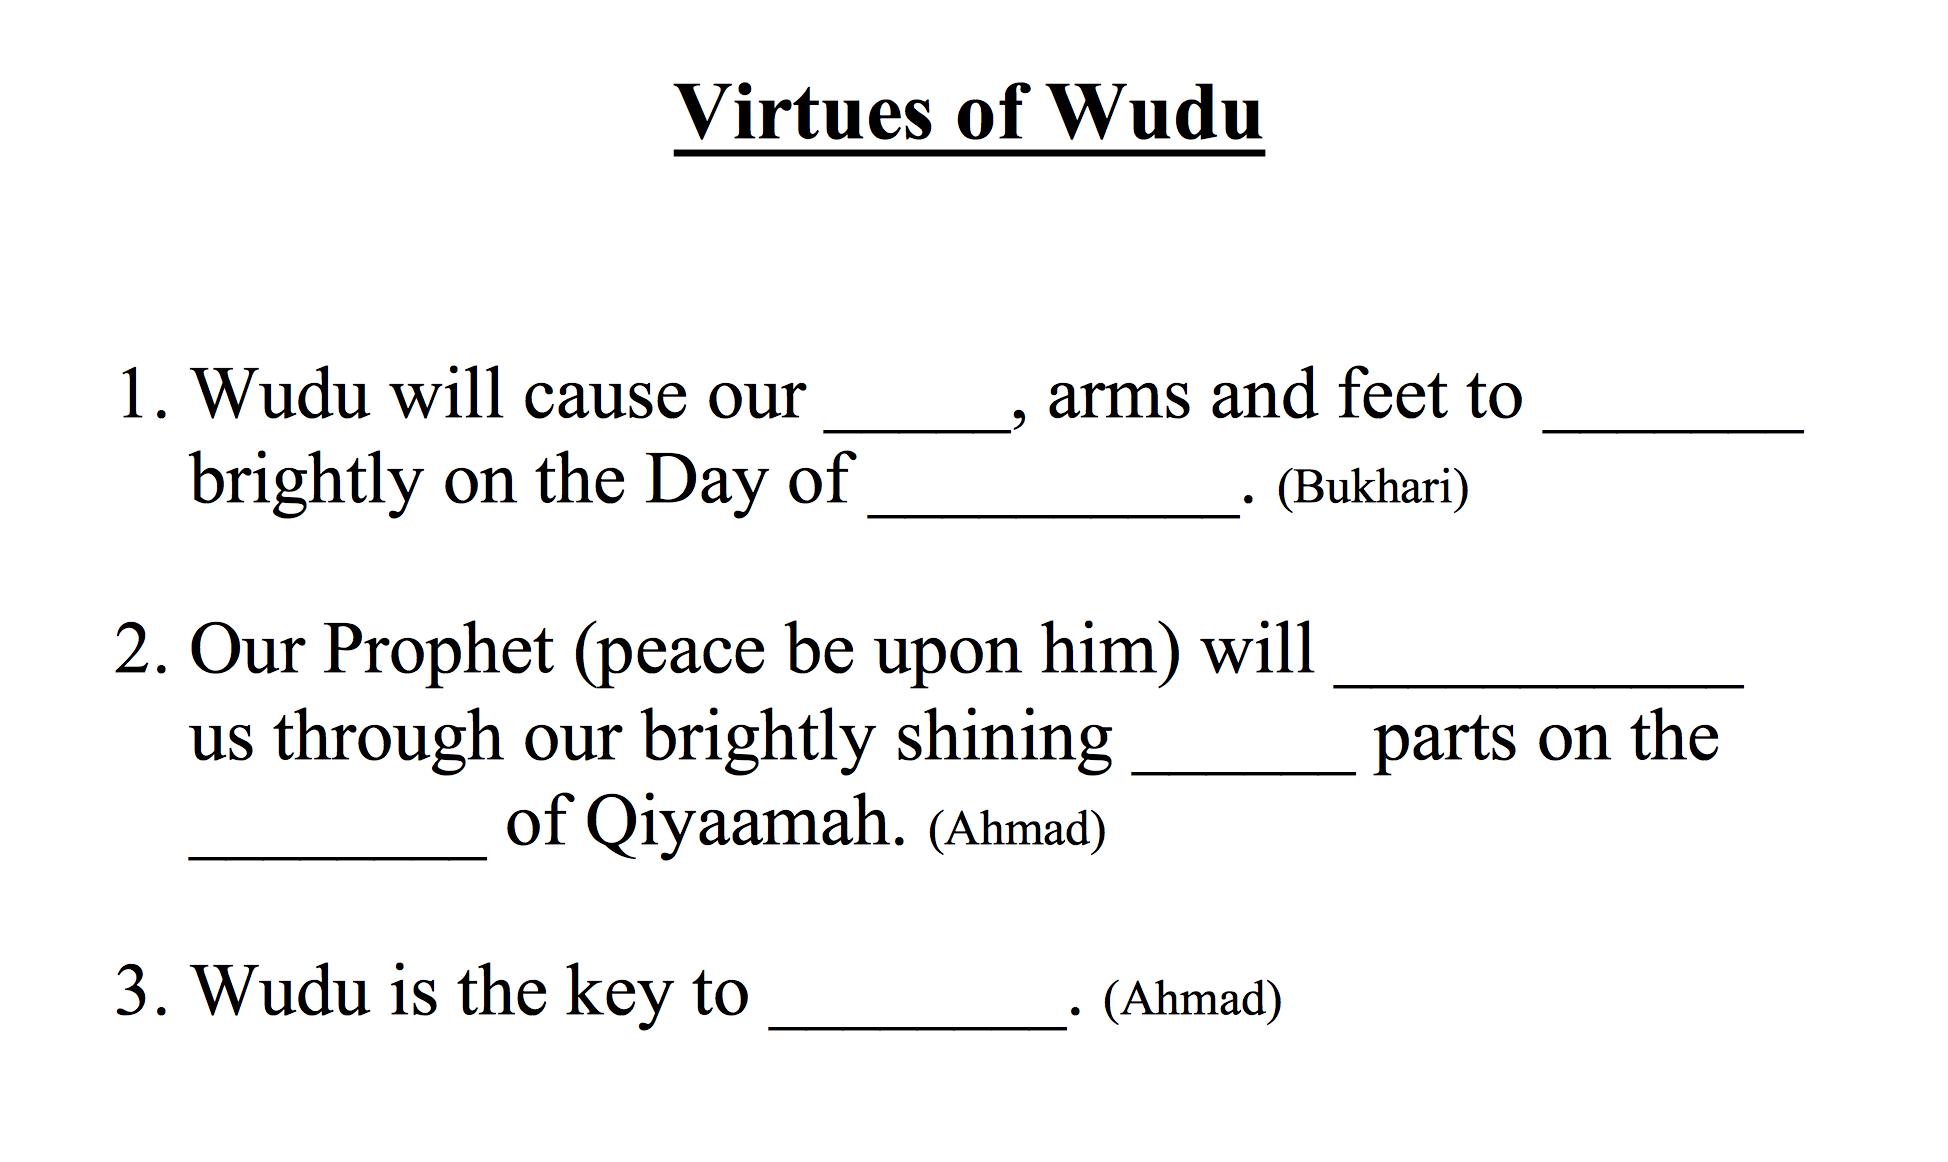 12 Virtues virtues & when to make wudu worksheet – safar resources